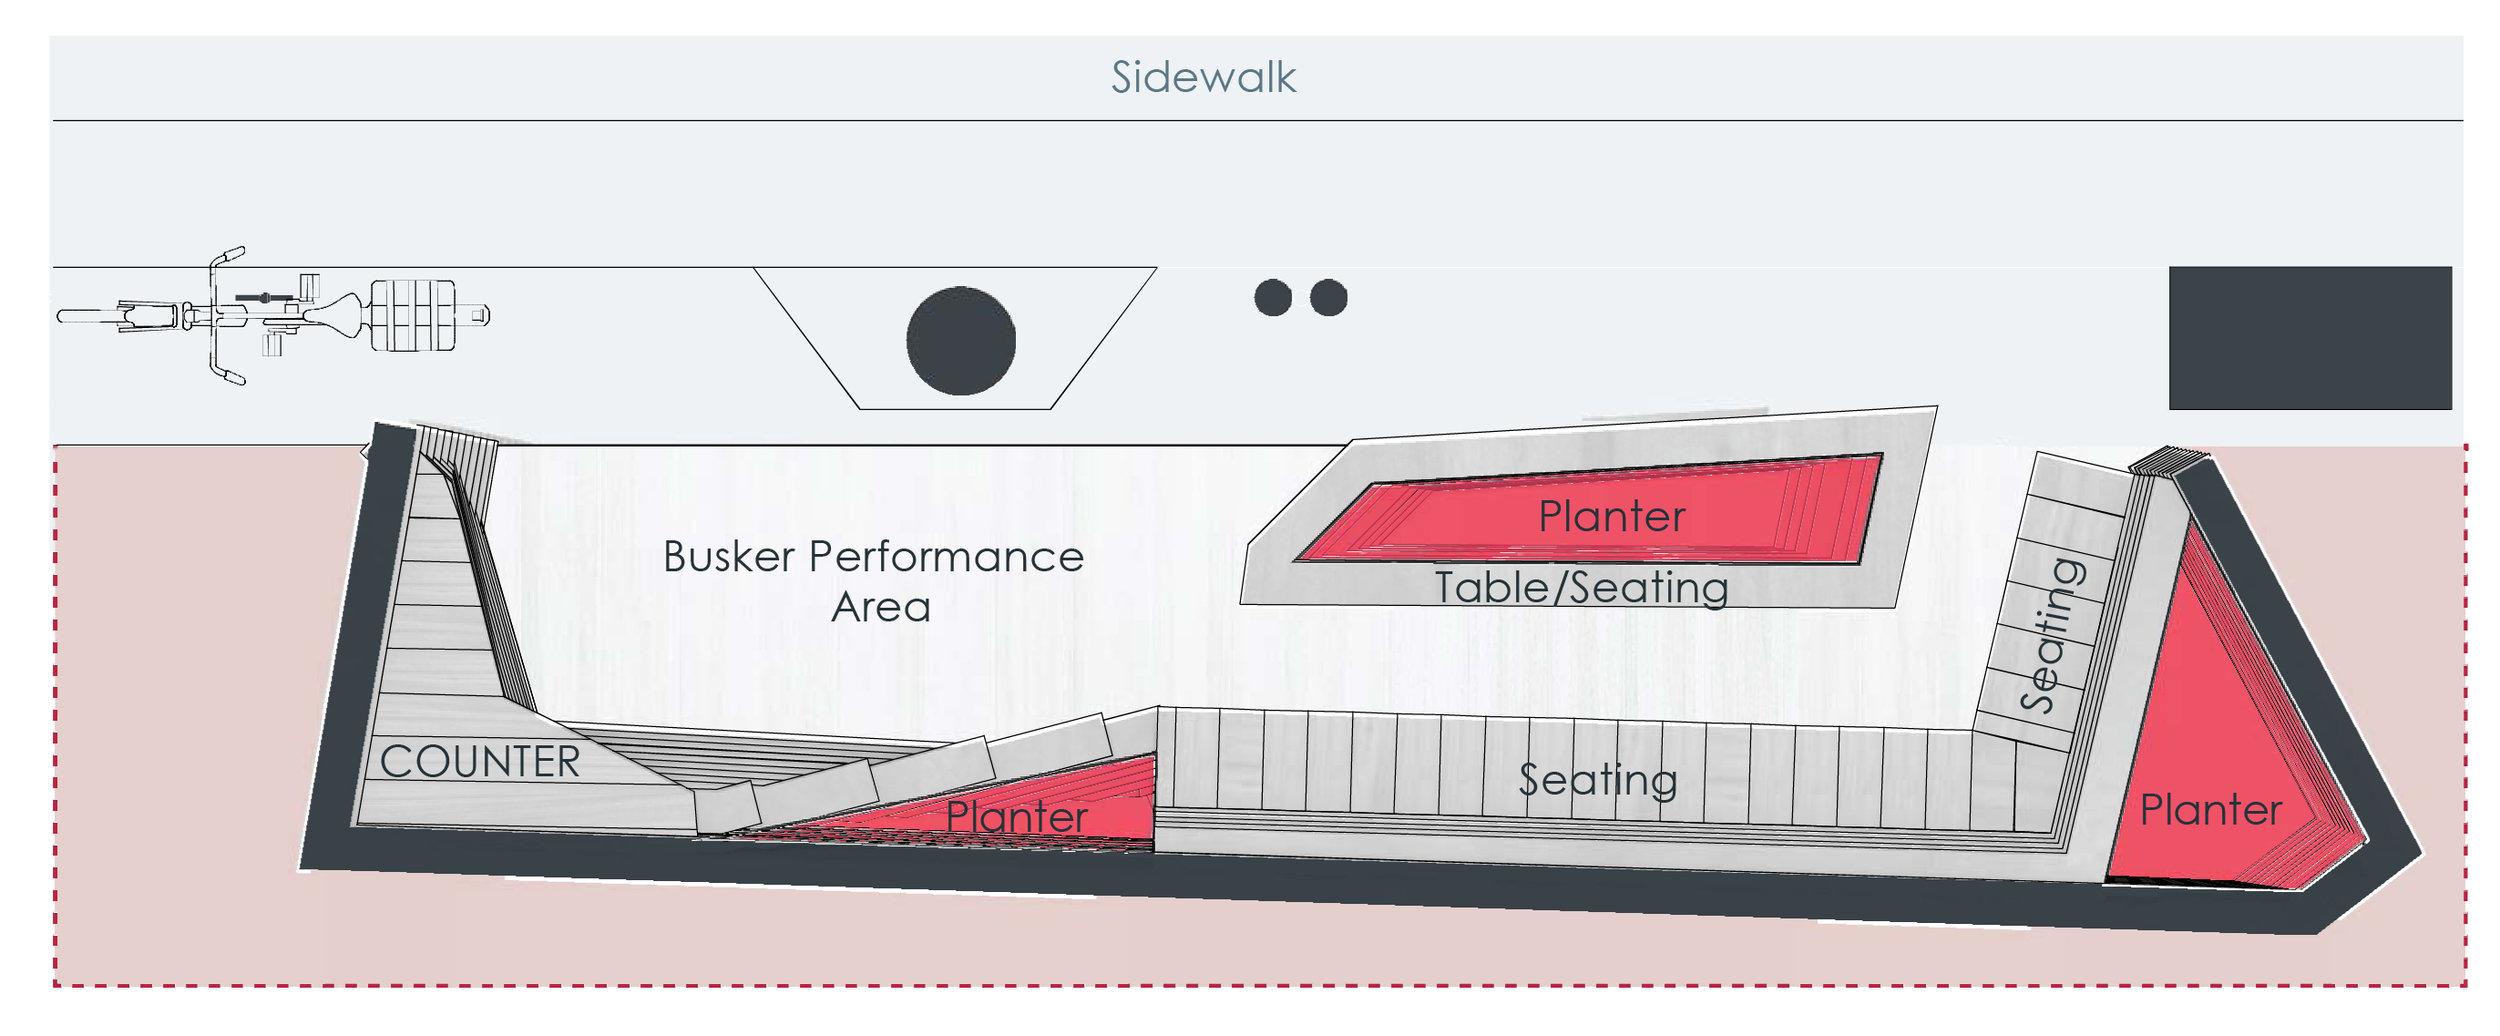 Plan-02.jpg